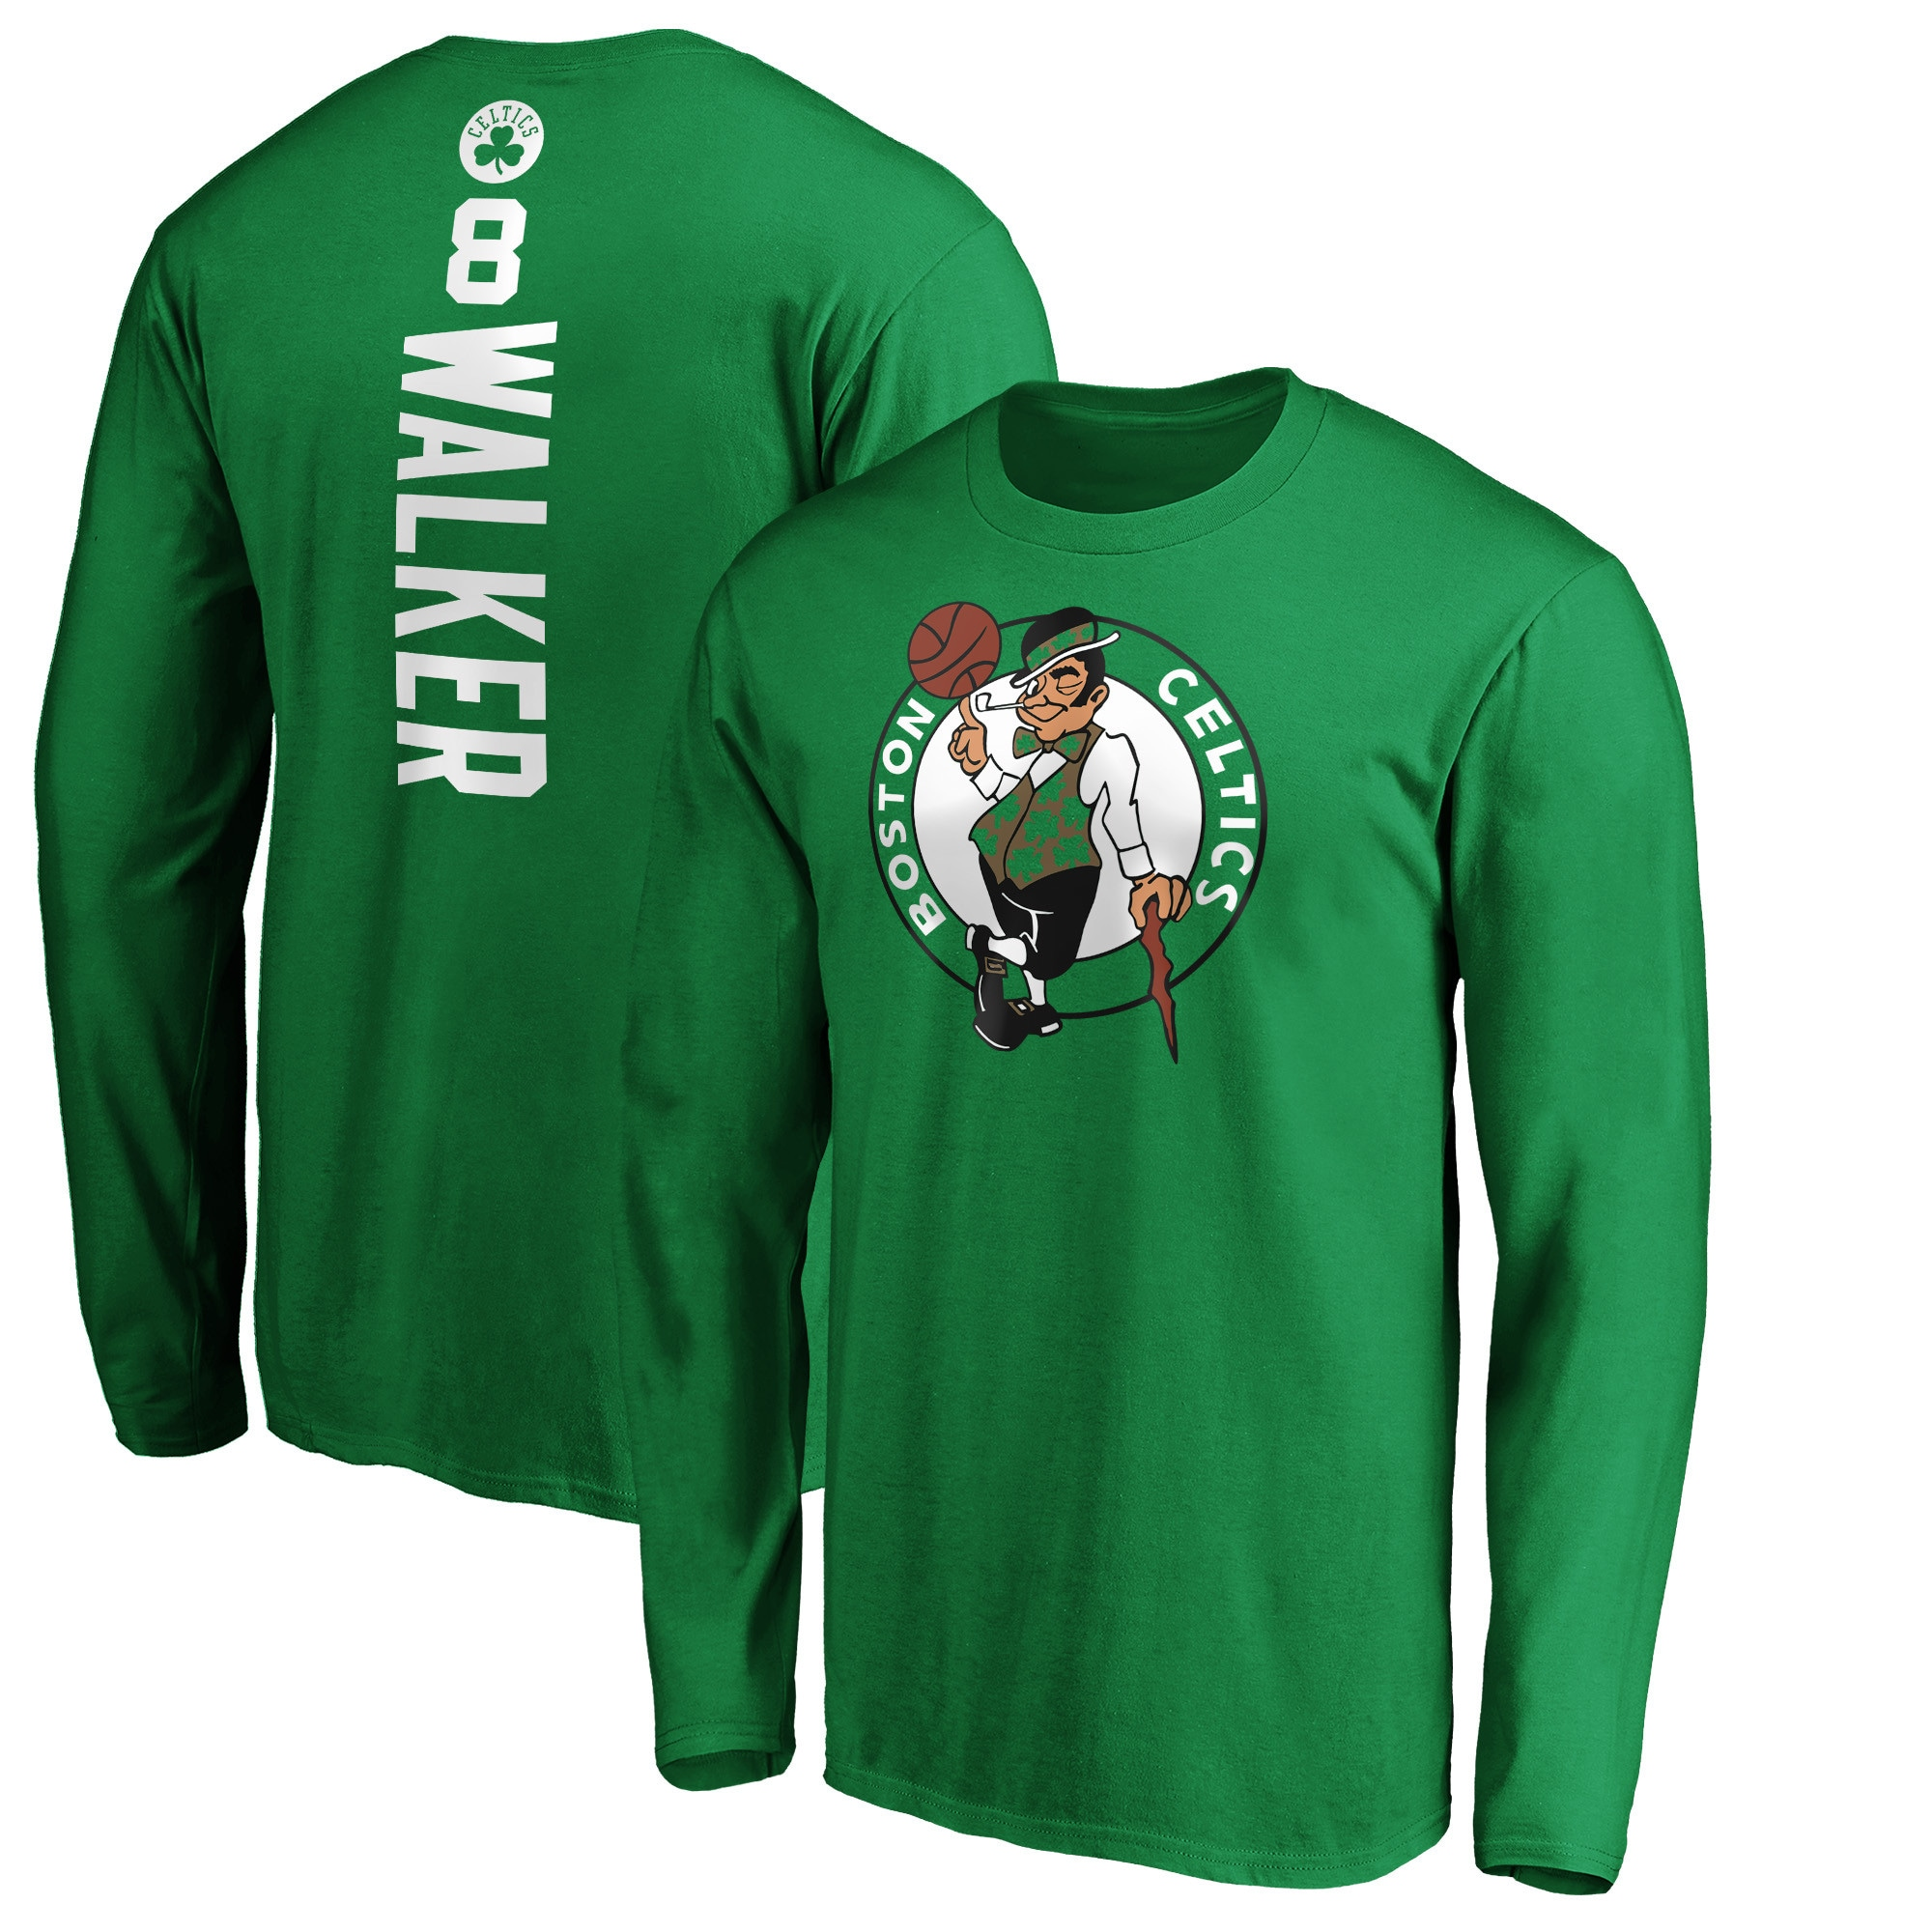 Kemba Walker Boston Celtics Fanatics Branded Team Playmaker Name & Number Long Sleeve T-Shirt - Kelly Green